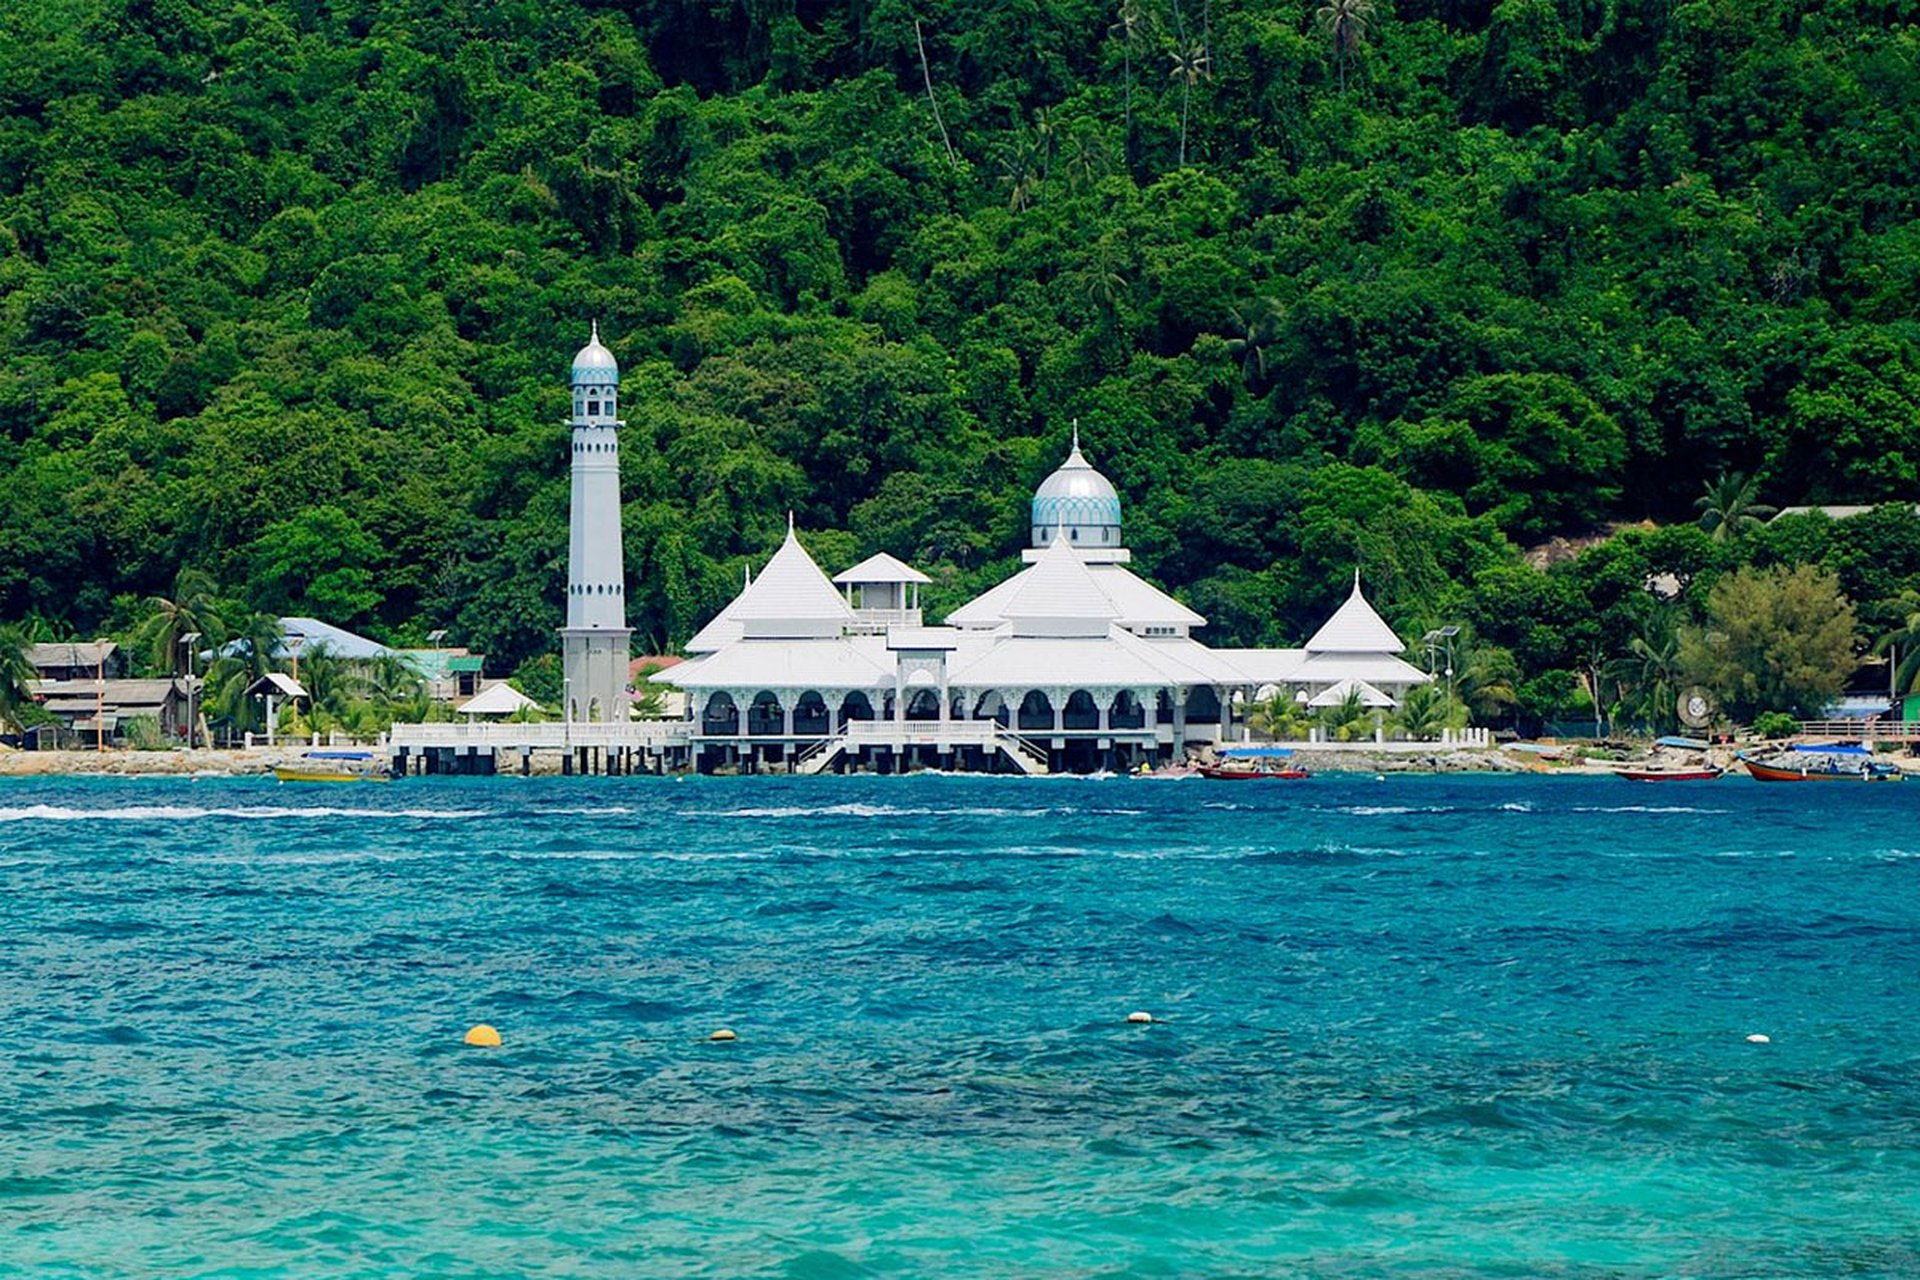 Quần đảo Pereaverian